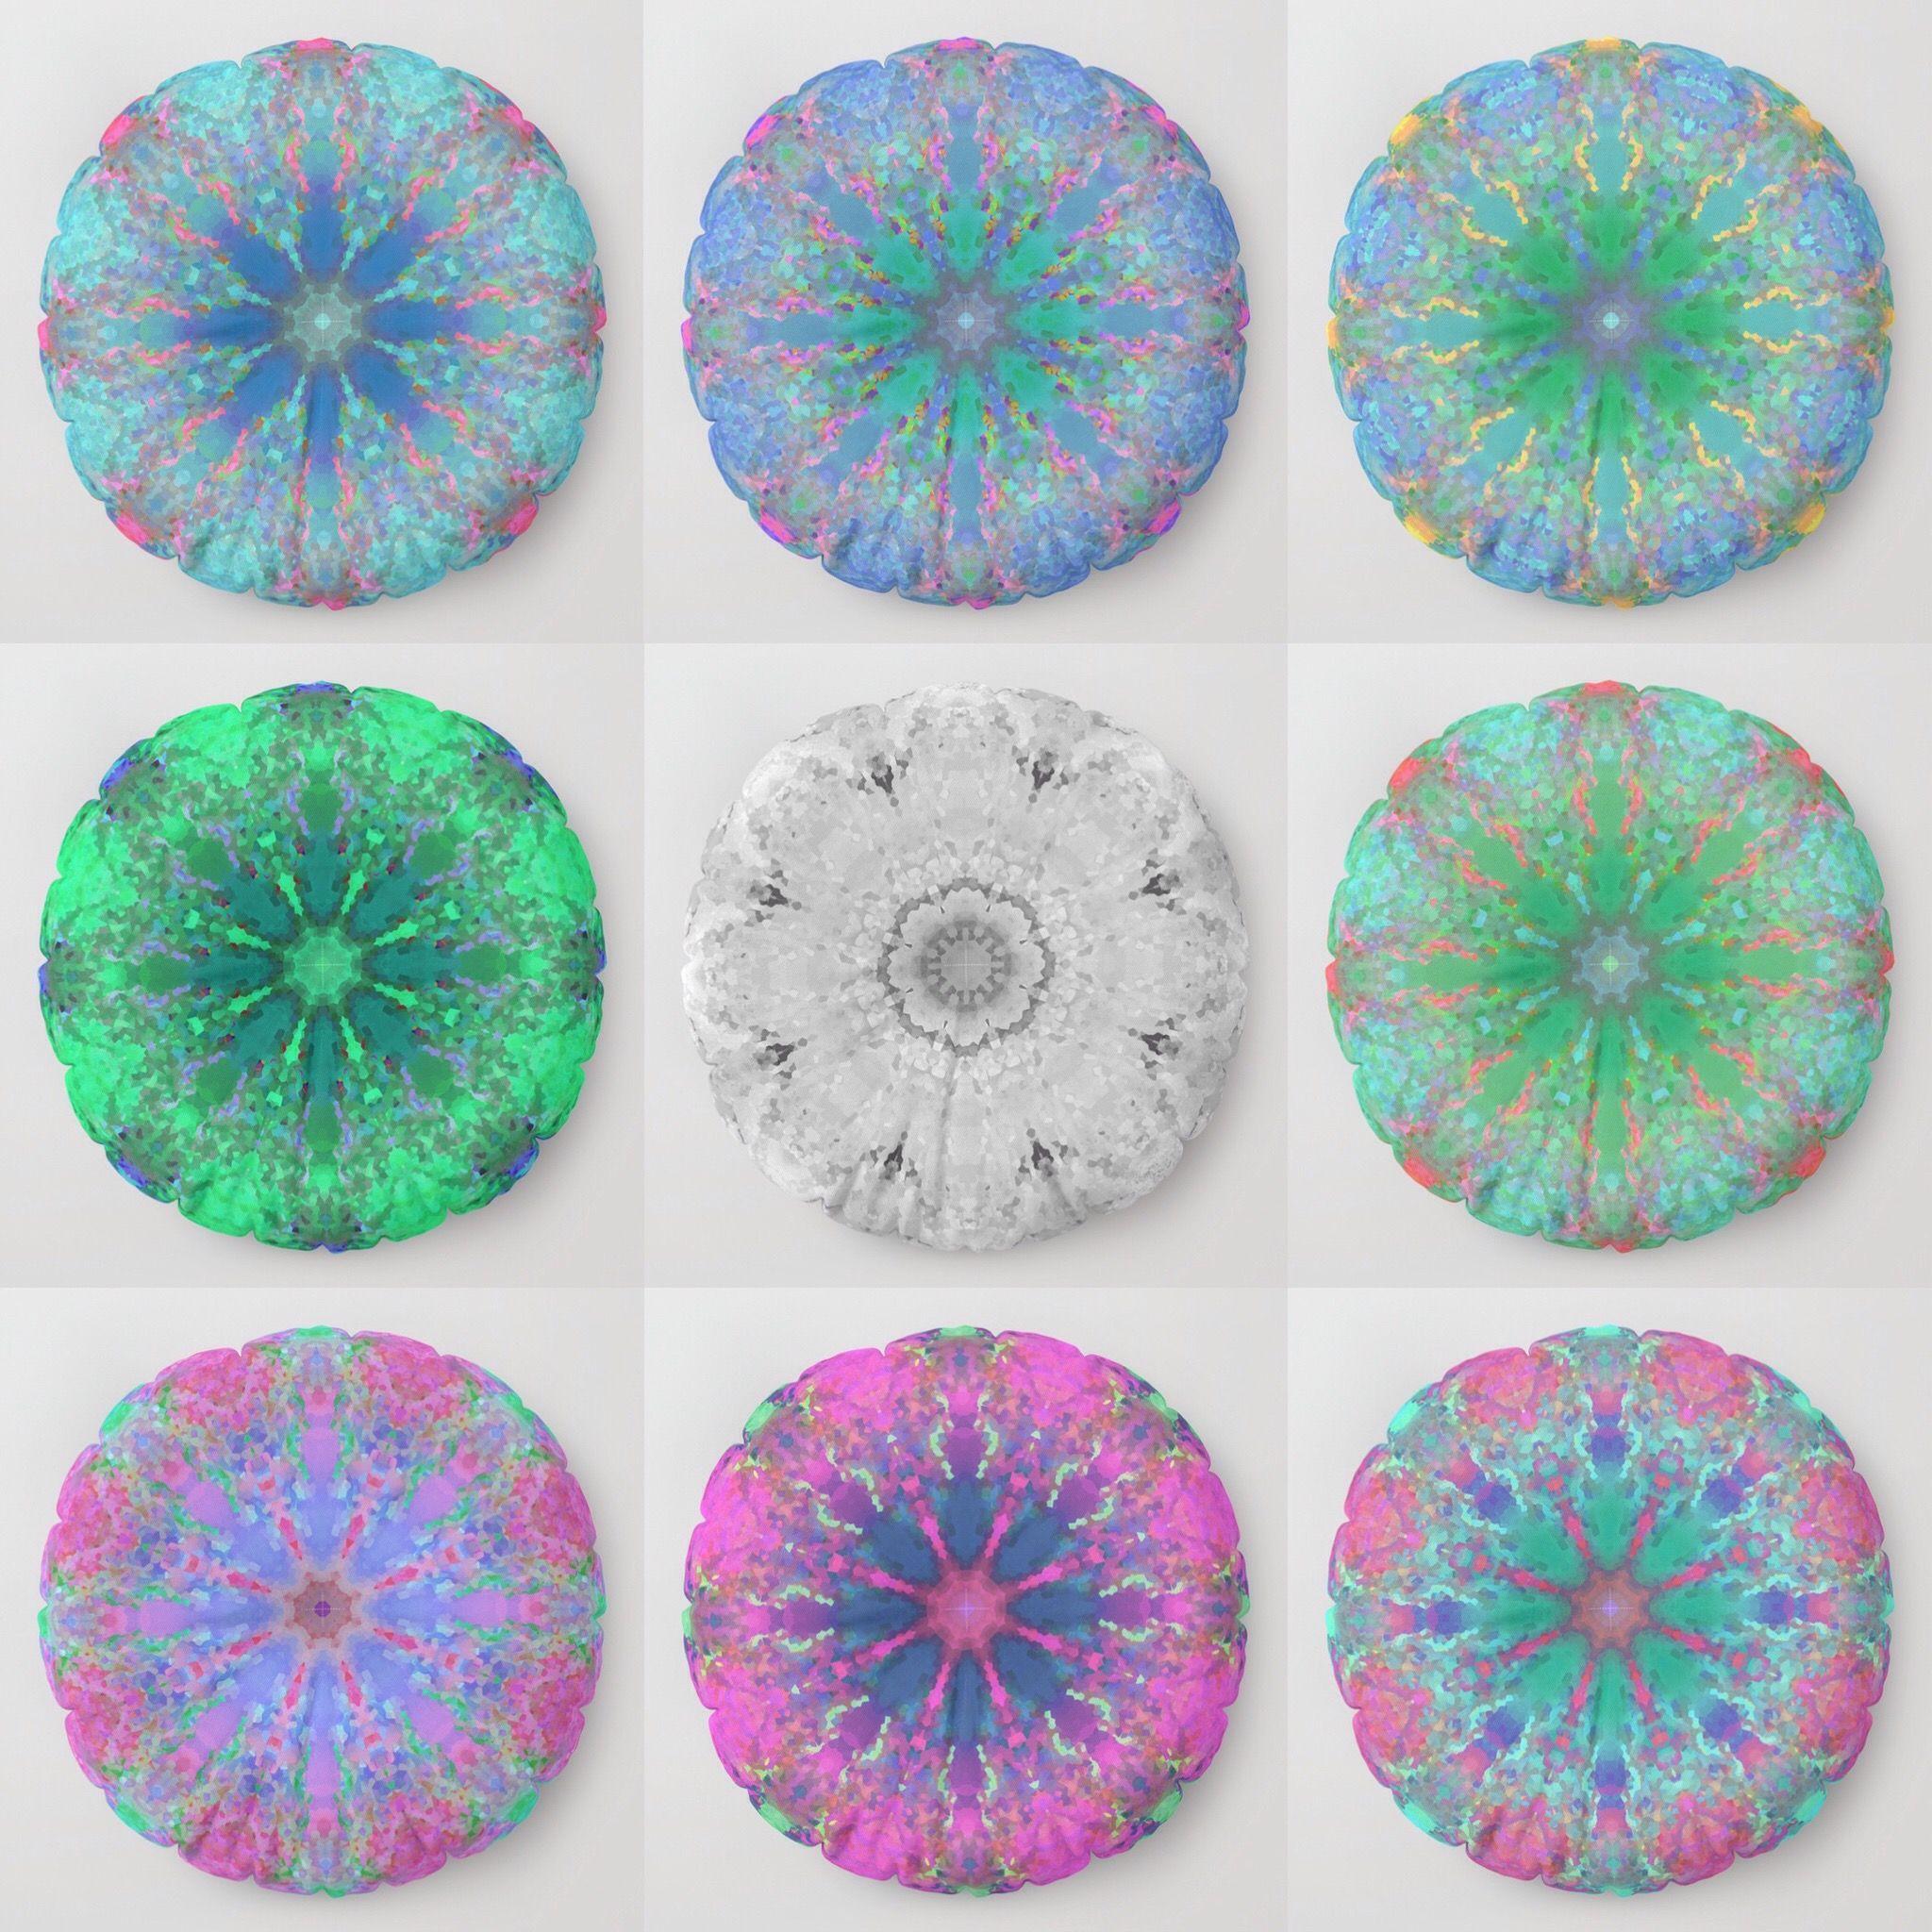 1000 mandalas challenge I plan on doing happy mandalas